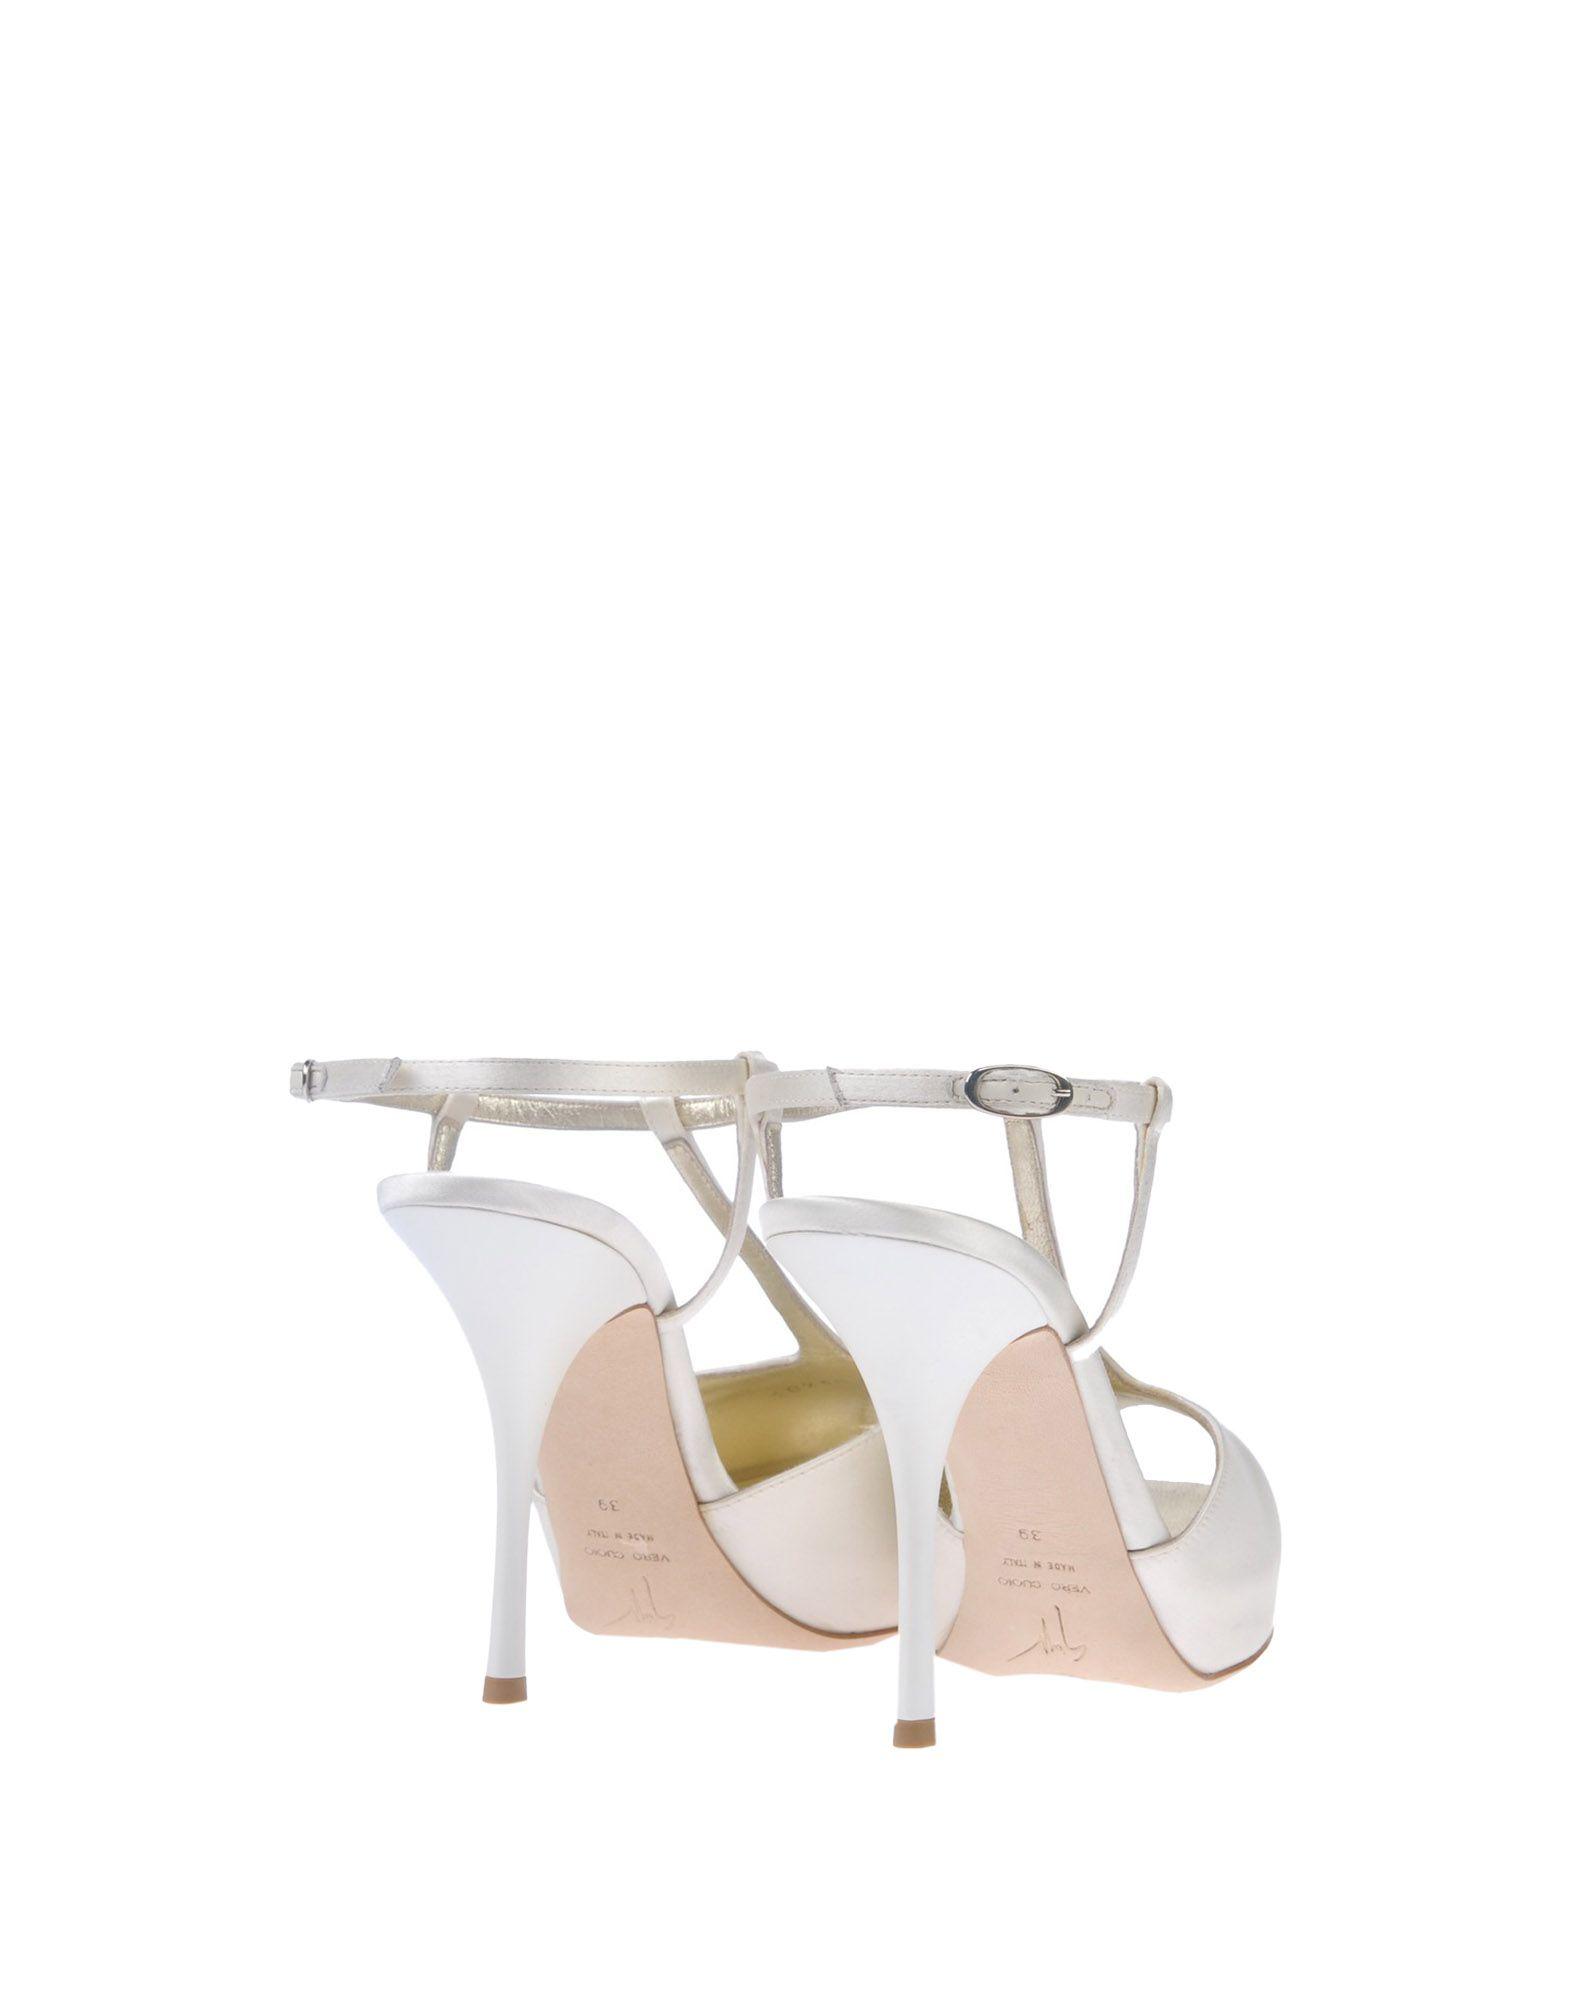 Giuseppe Zanotti Sandalen Damen  11413949OVGut aussehende aussehende aussehende strapazierfähige Schuhe 30dfbc